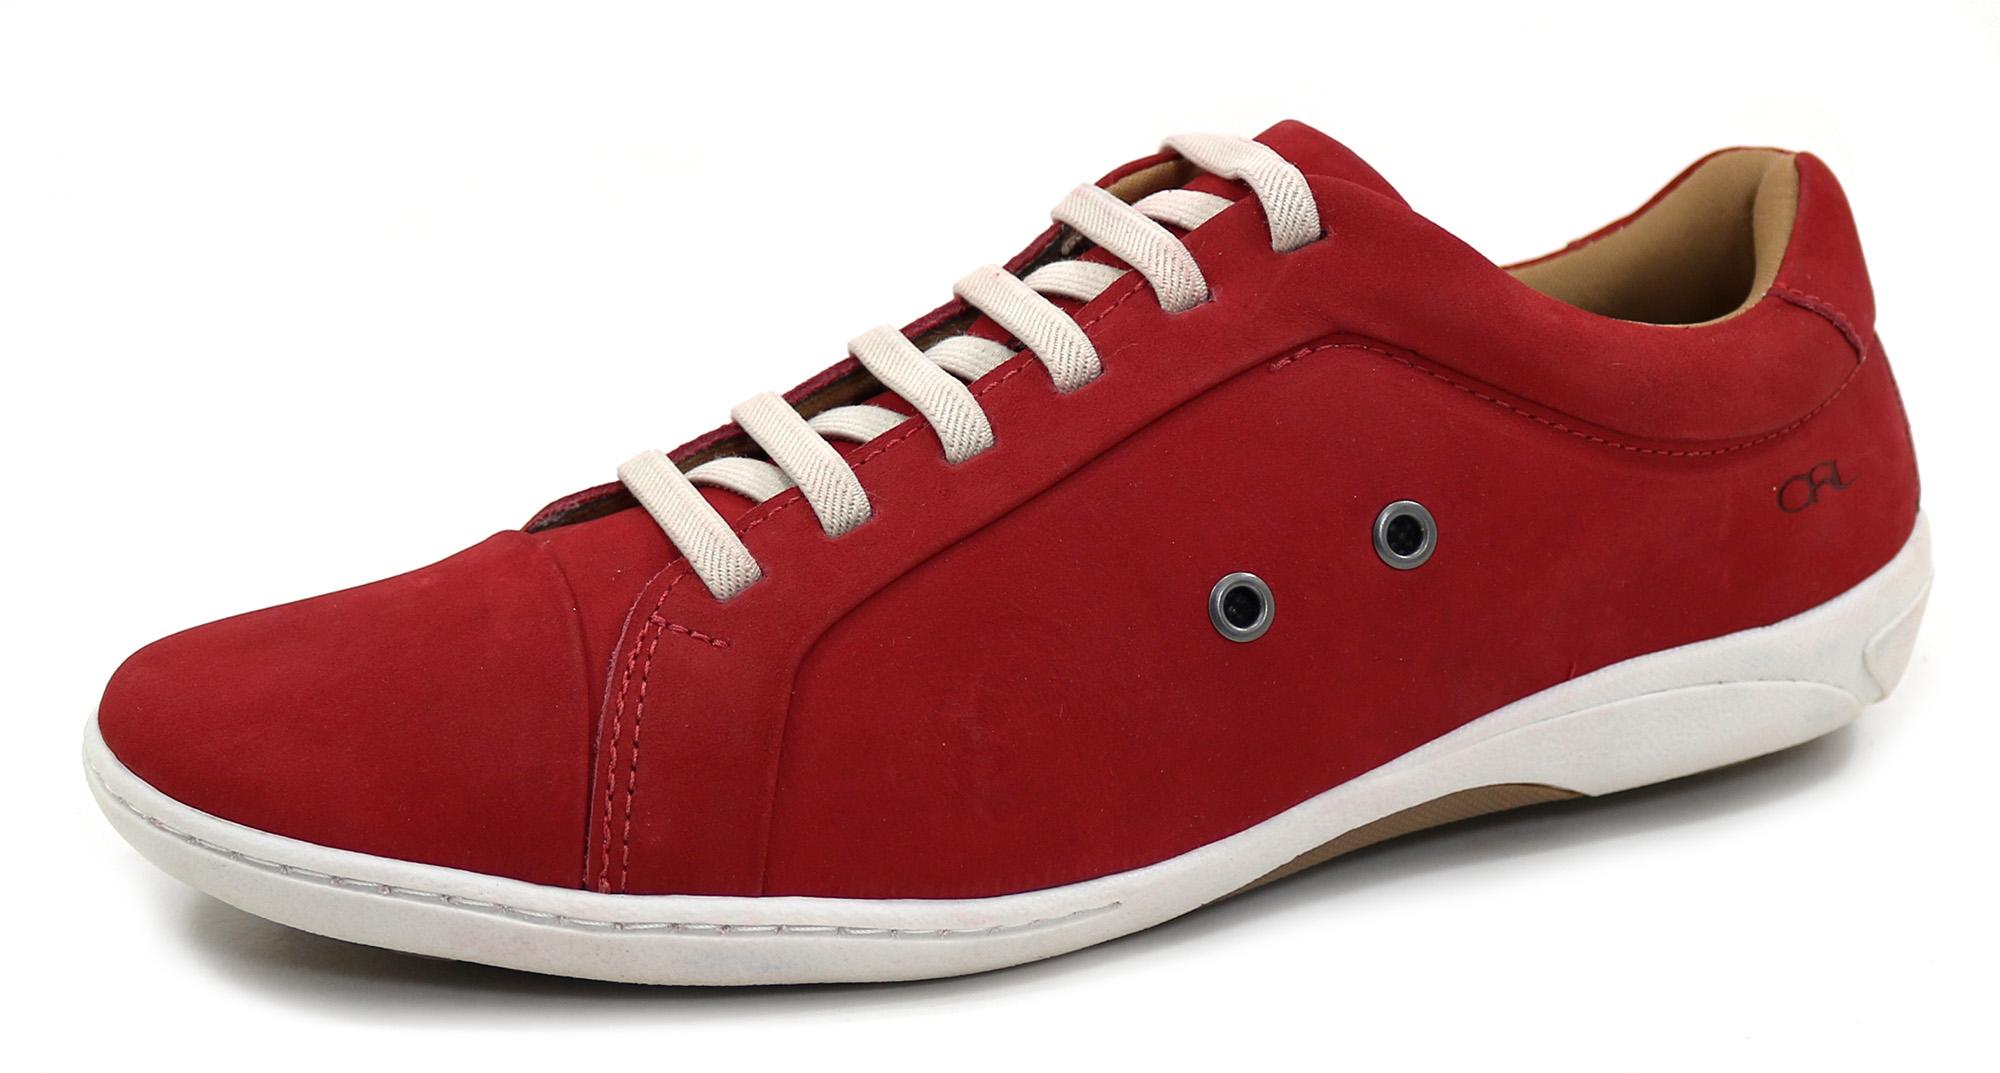 b571a4d135 Kit 2 pares Sapatenis Masculino Casual Orlandelli 05101 - Sapatos de ...